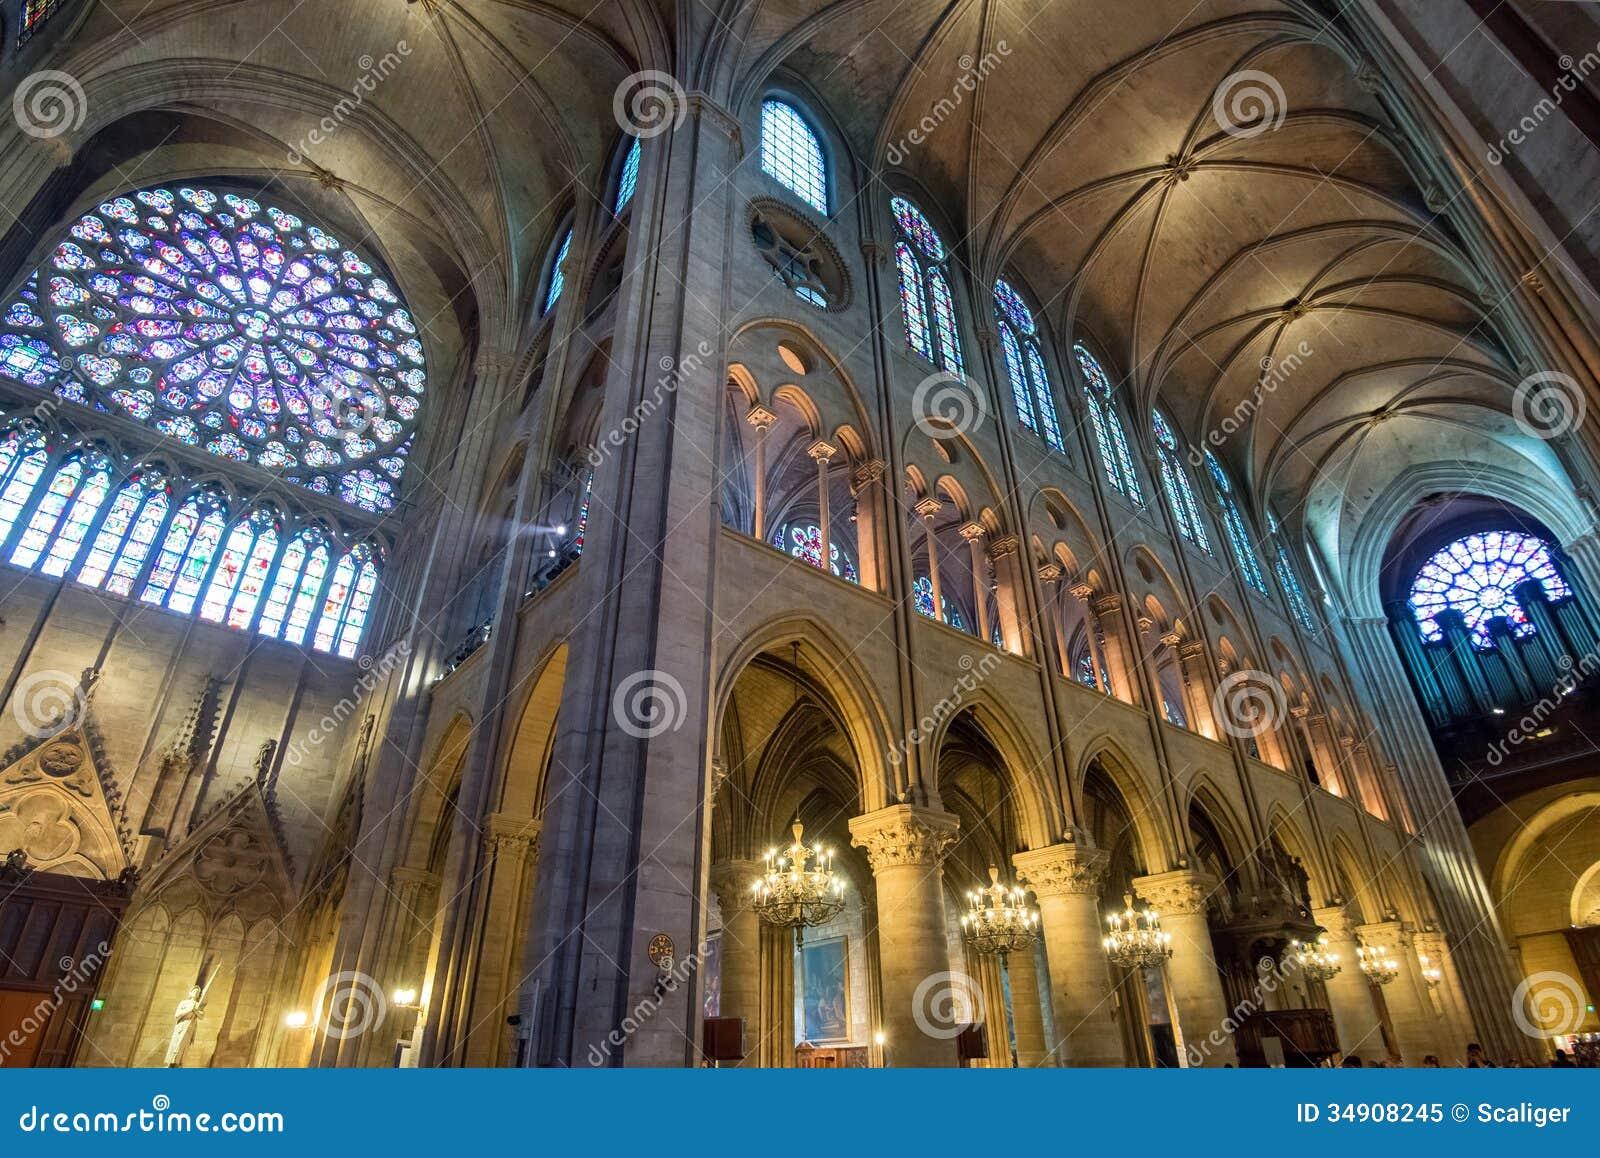 innenraum des notre dame de paris stockbild bild von religion inside 34908245. Black Bedroom Furniture Sets. Home Design Ideas